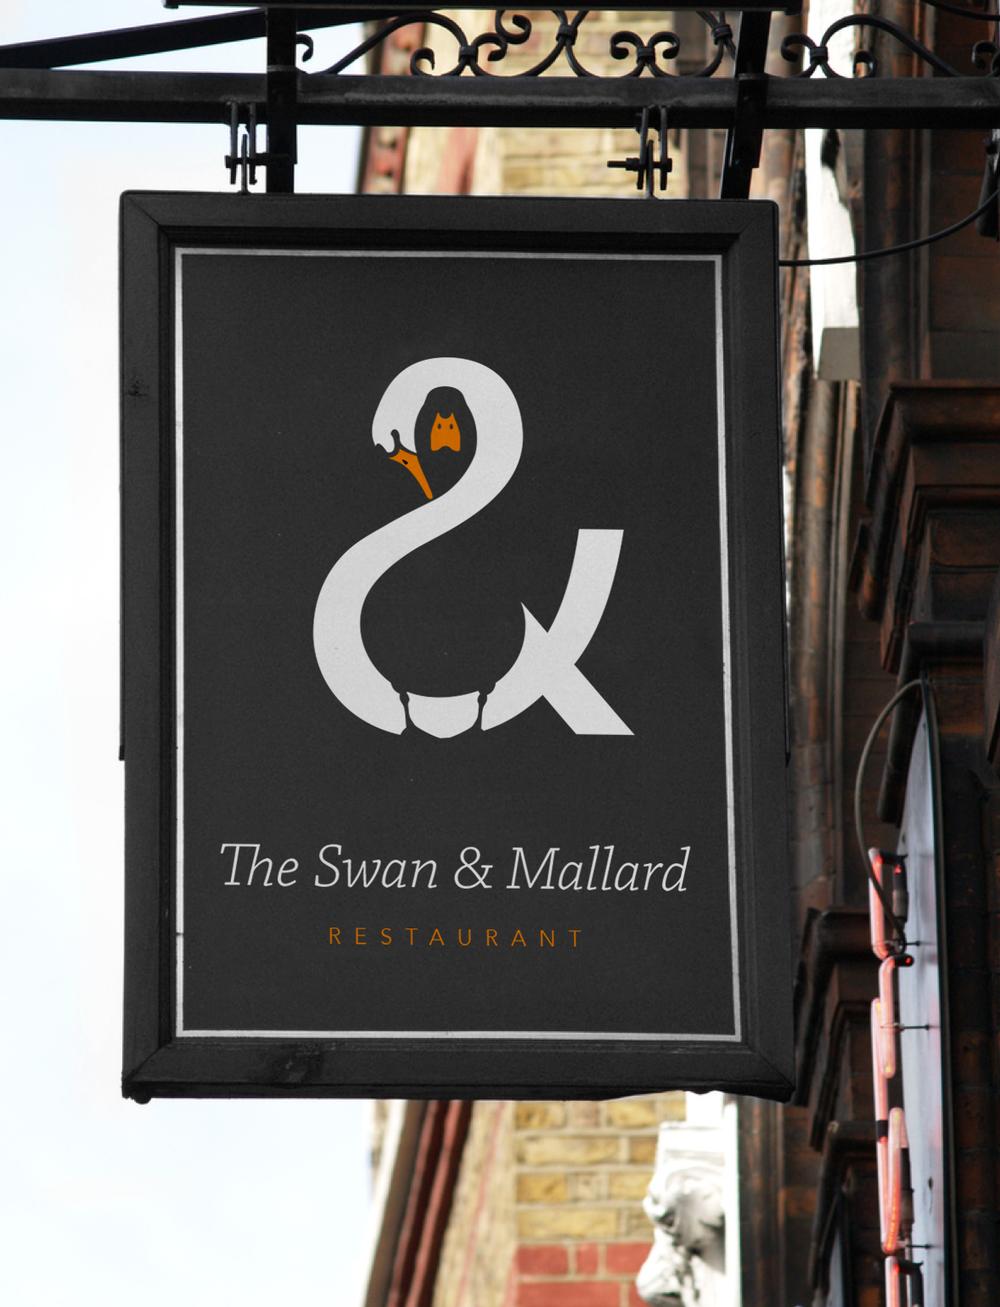 John Randall / The Swan & Mallard